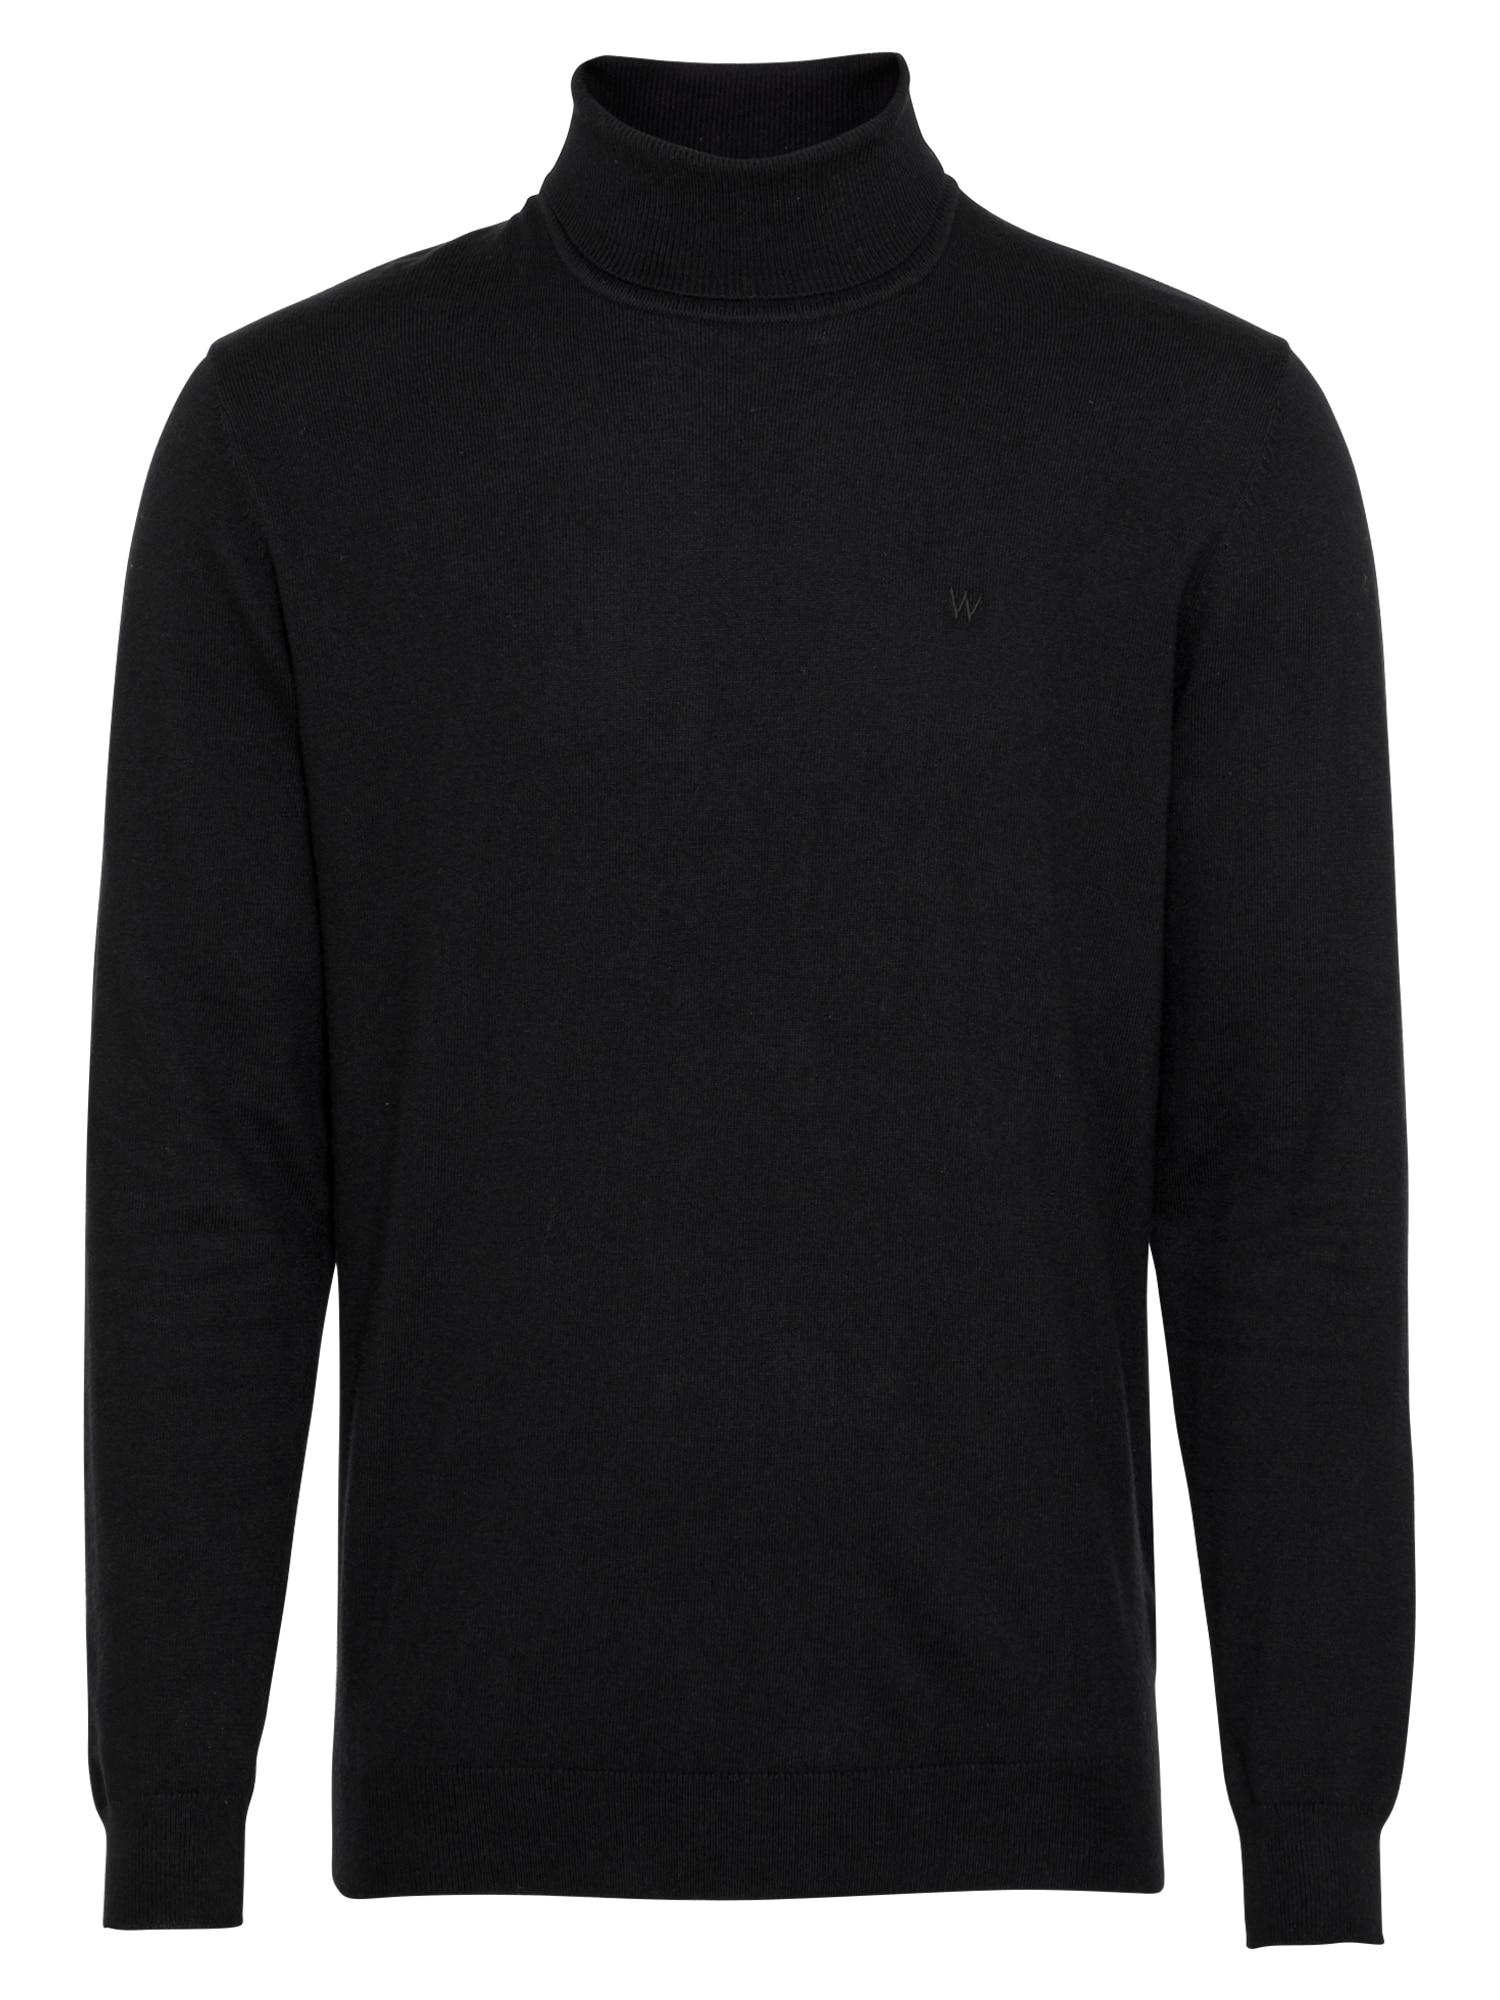 WRANGLER Megztinis juoda